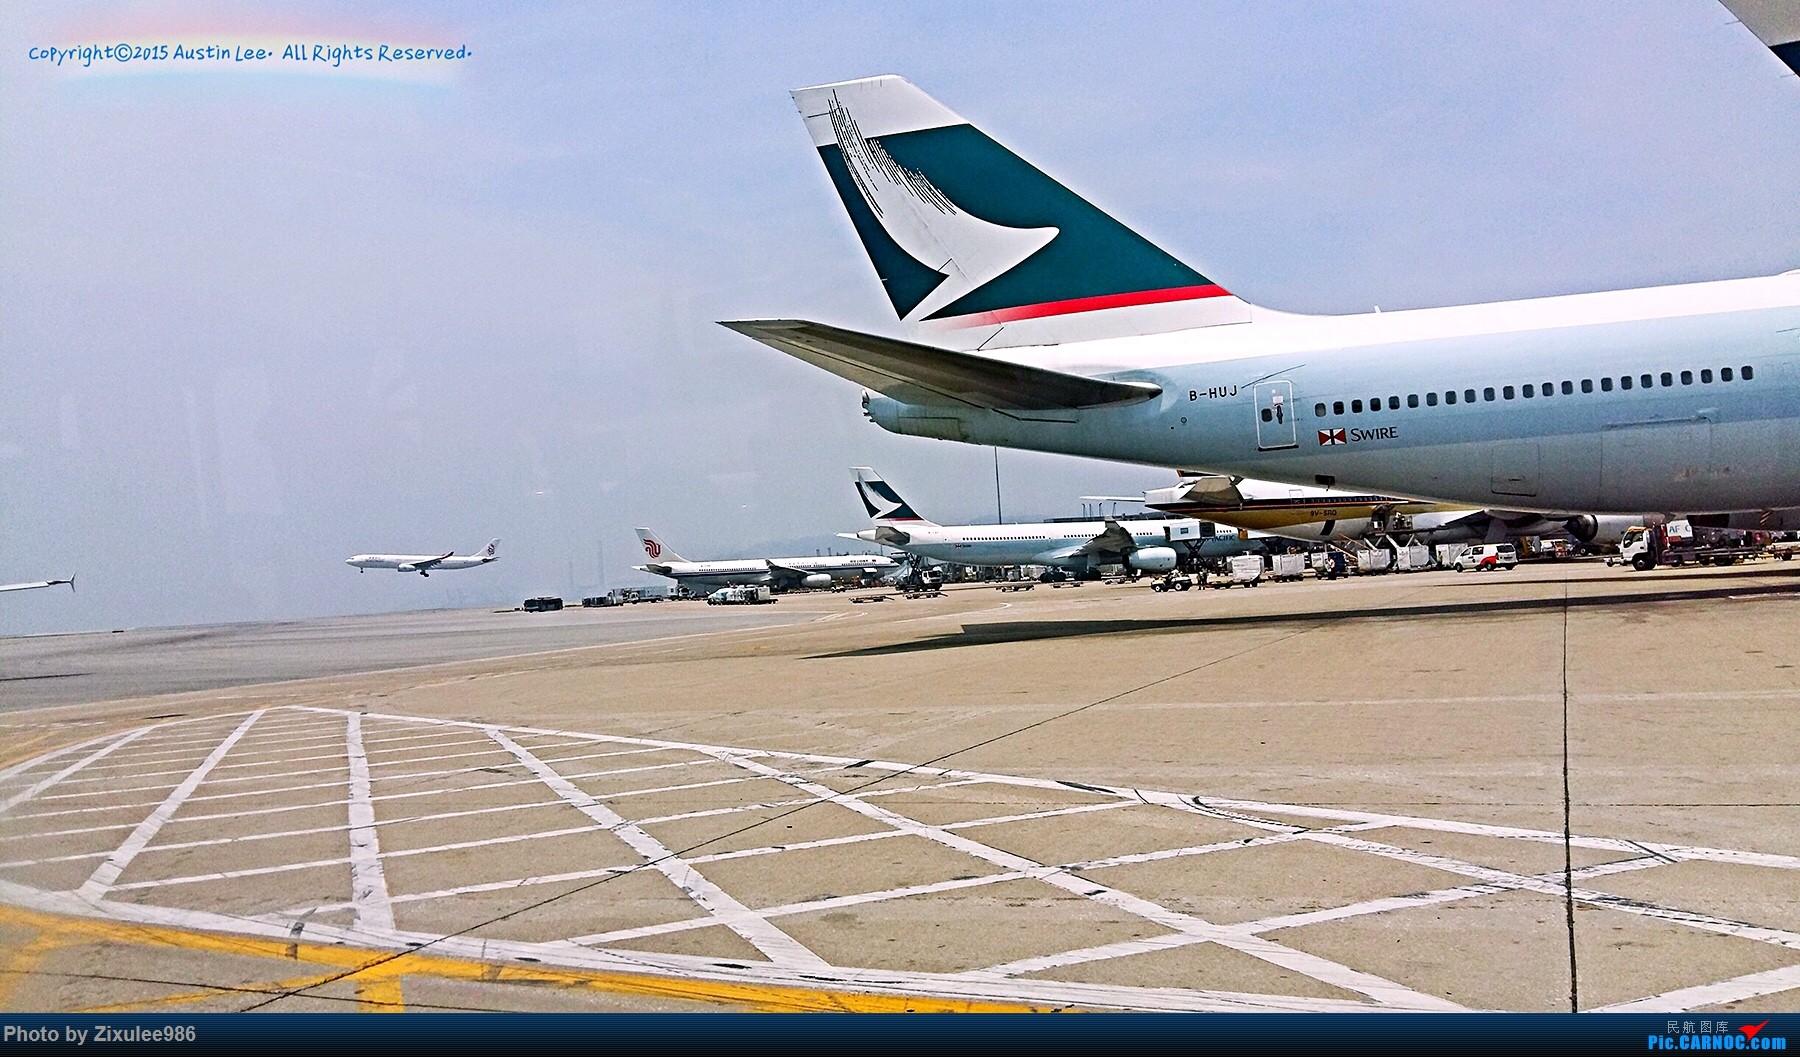 Re:[原创]三年旅途的随拍精选~持续不定时update BOEING 747-467 B-HUJ 中国香港国际机场